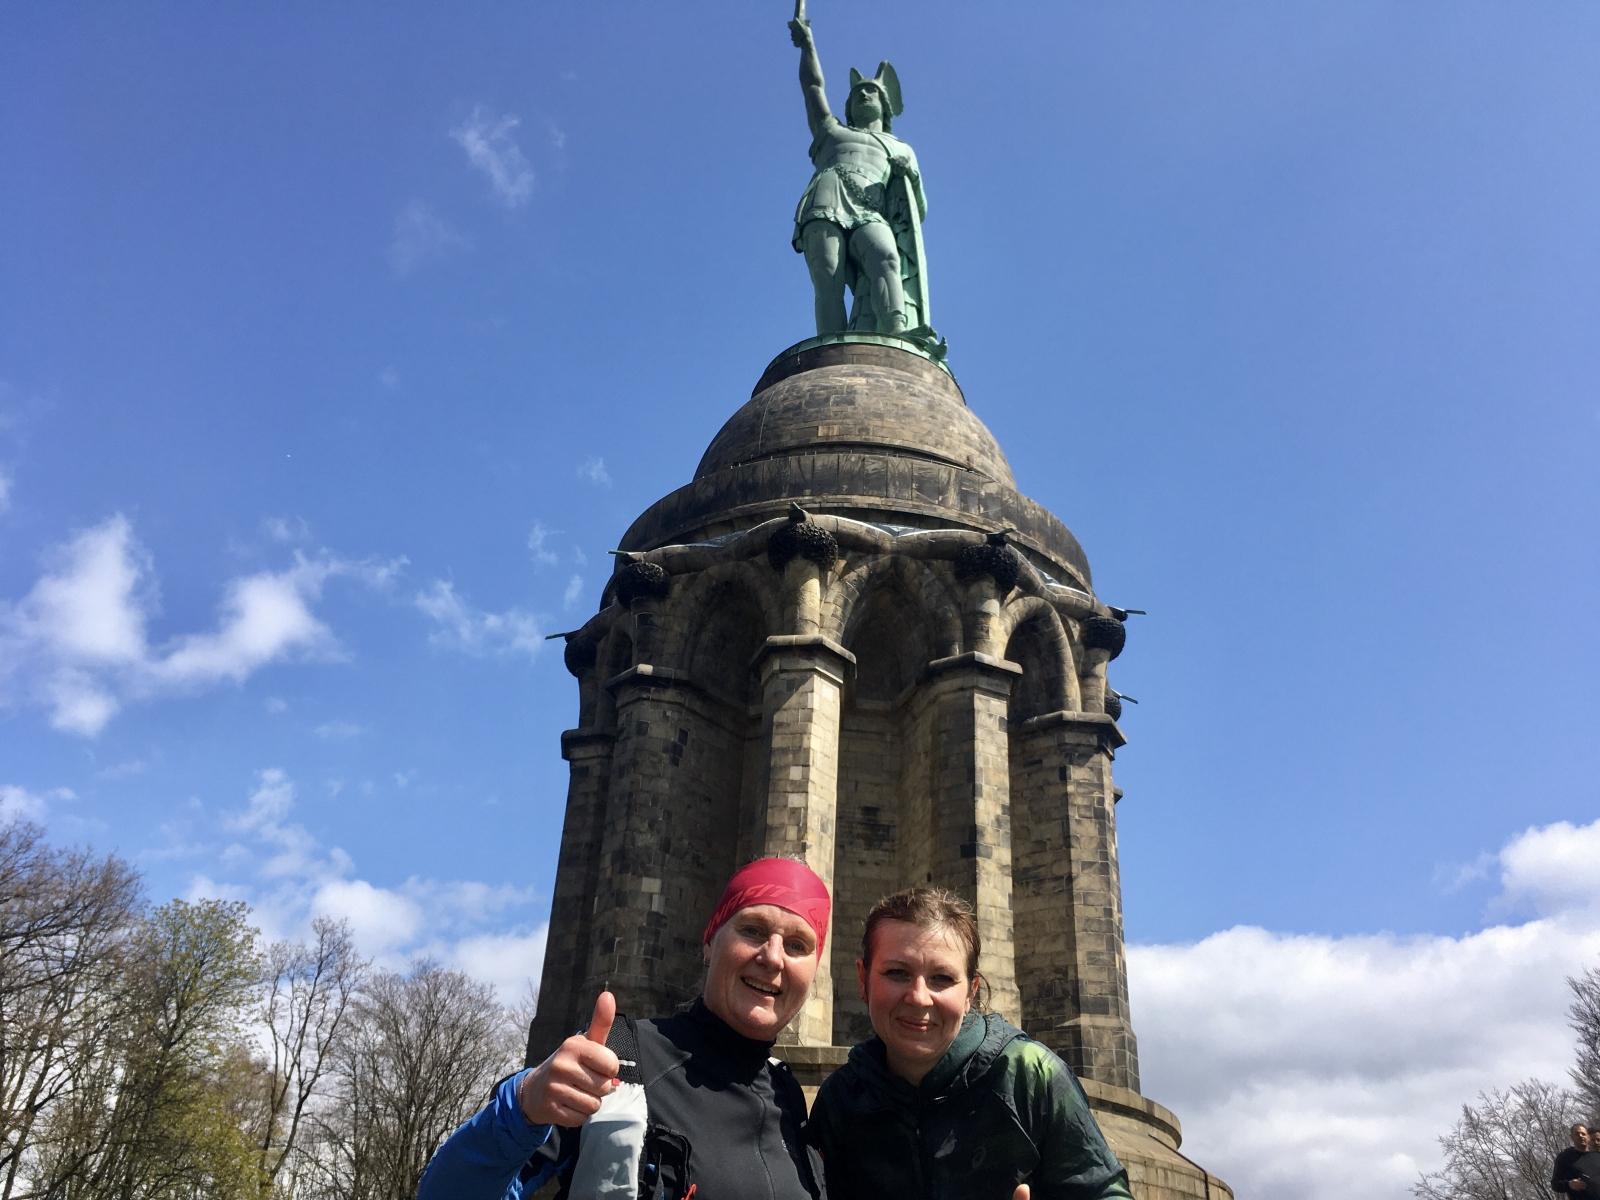 Turow-Gaszcczak-Michaela-16-Challenge-Hermannslauf-Team-ZKL4D